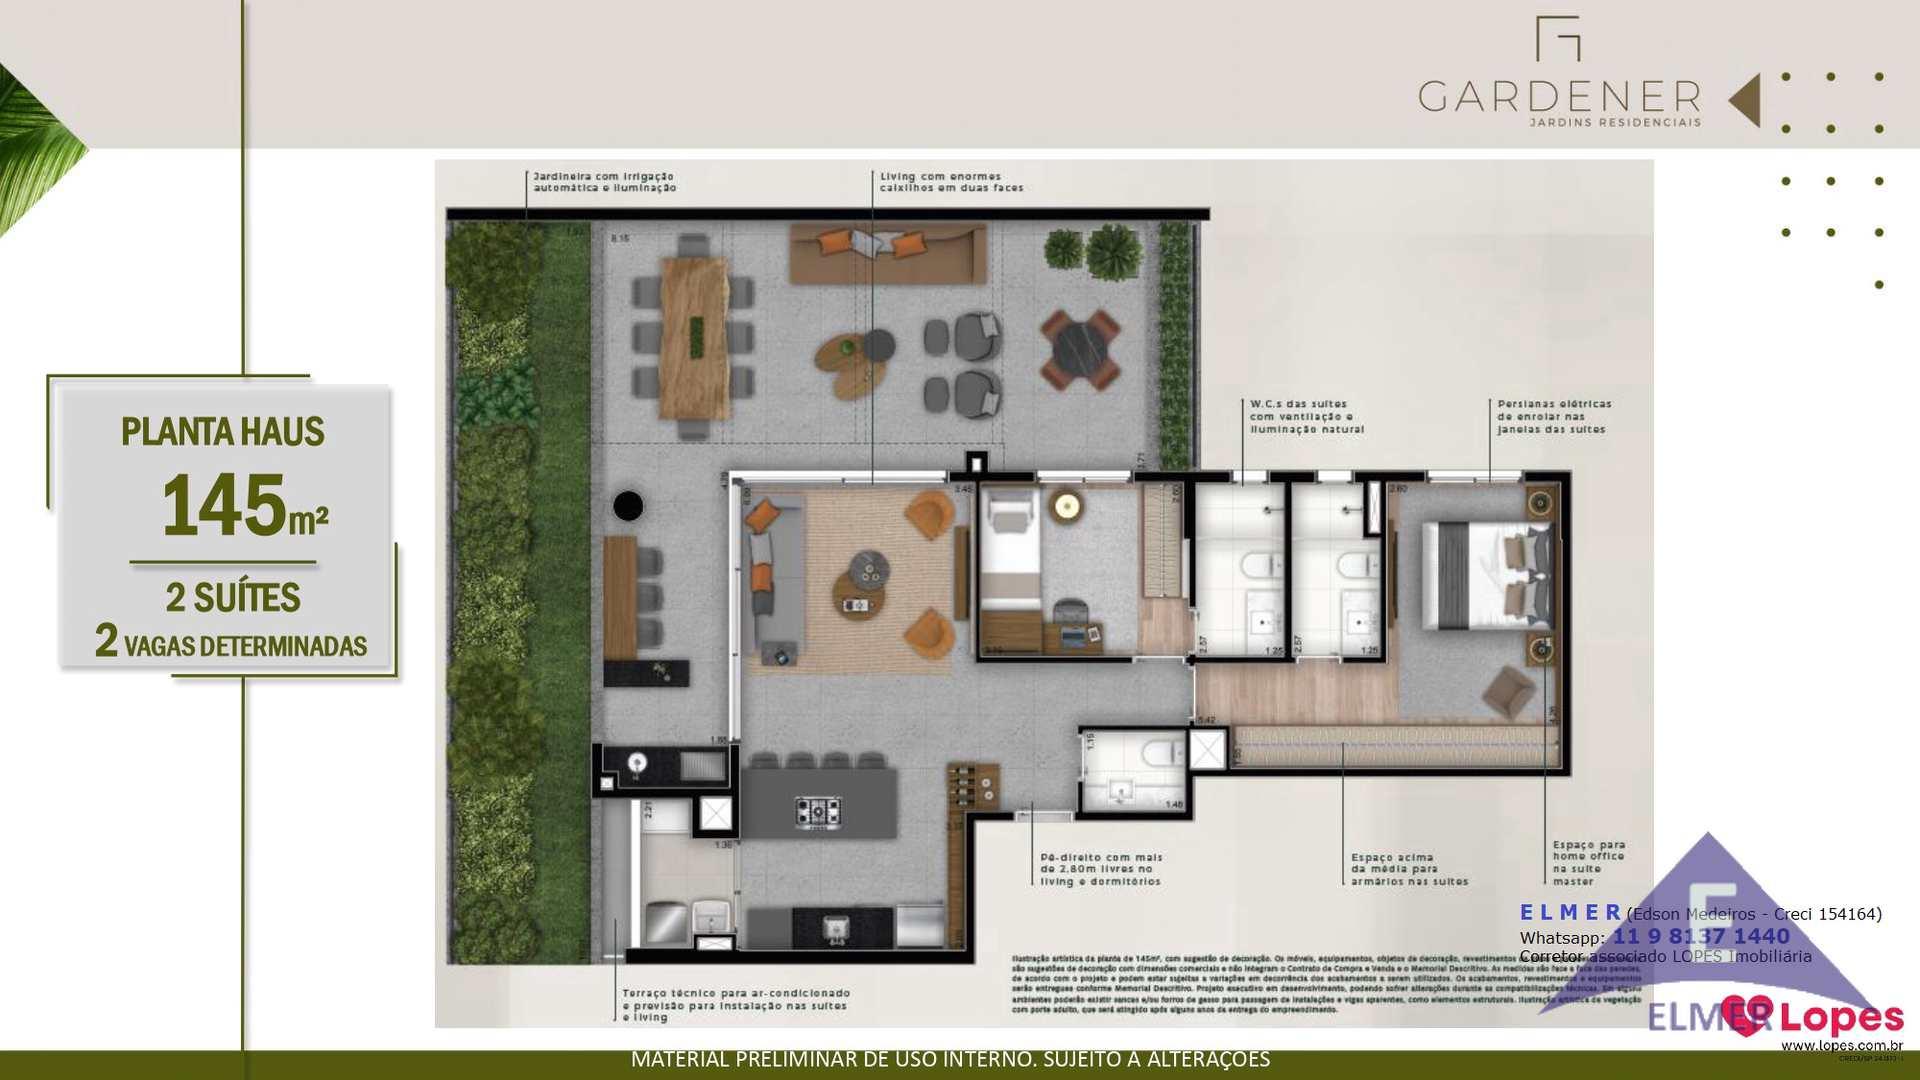 Planta HAUS 145 m² - GARDENER - Elmer